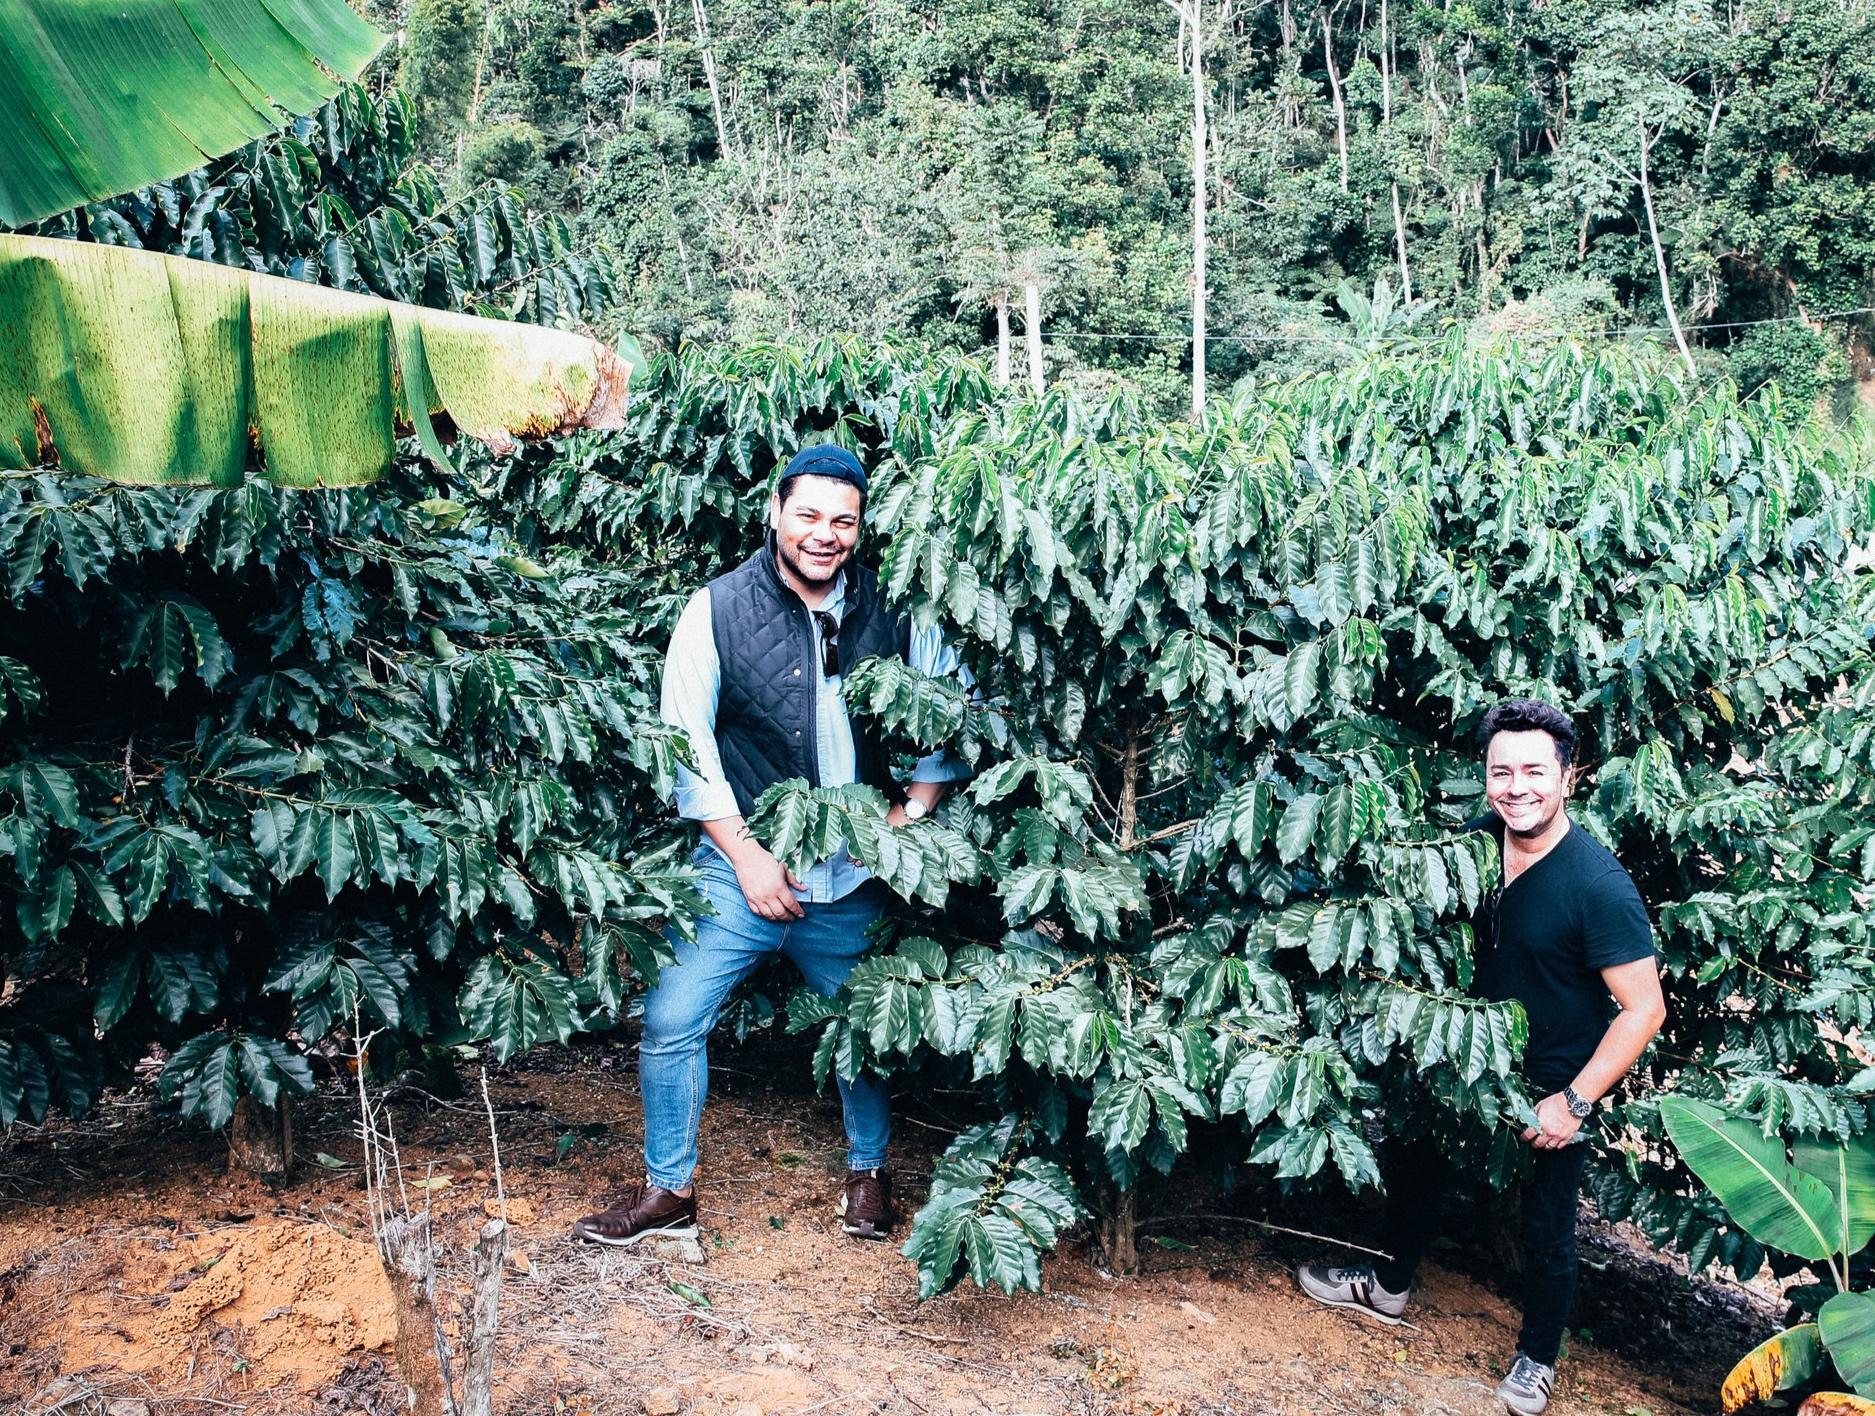 Meet the owners of Hacienda Iluminada & 787 Coffee: Brandon & Sam